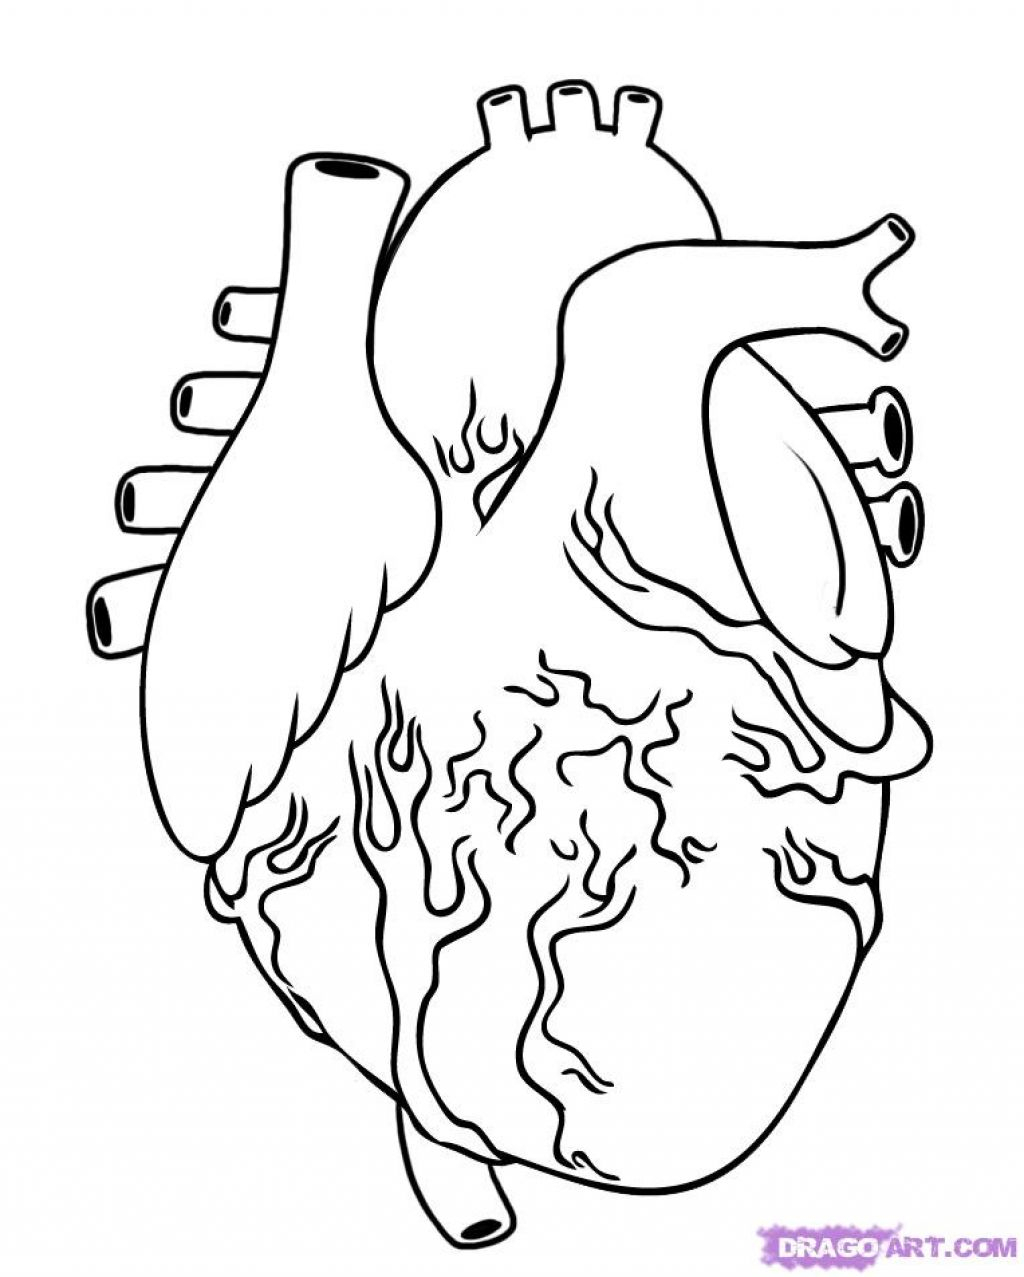 1024x1277 Simple Human Heart Drawing Simple Human Heart Drawing